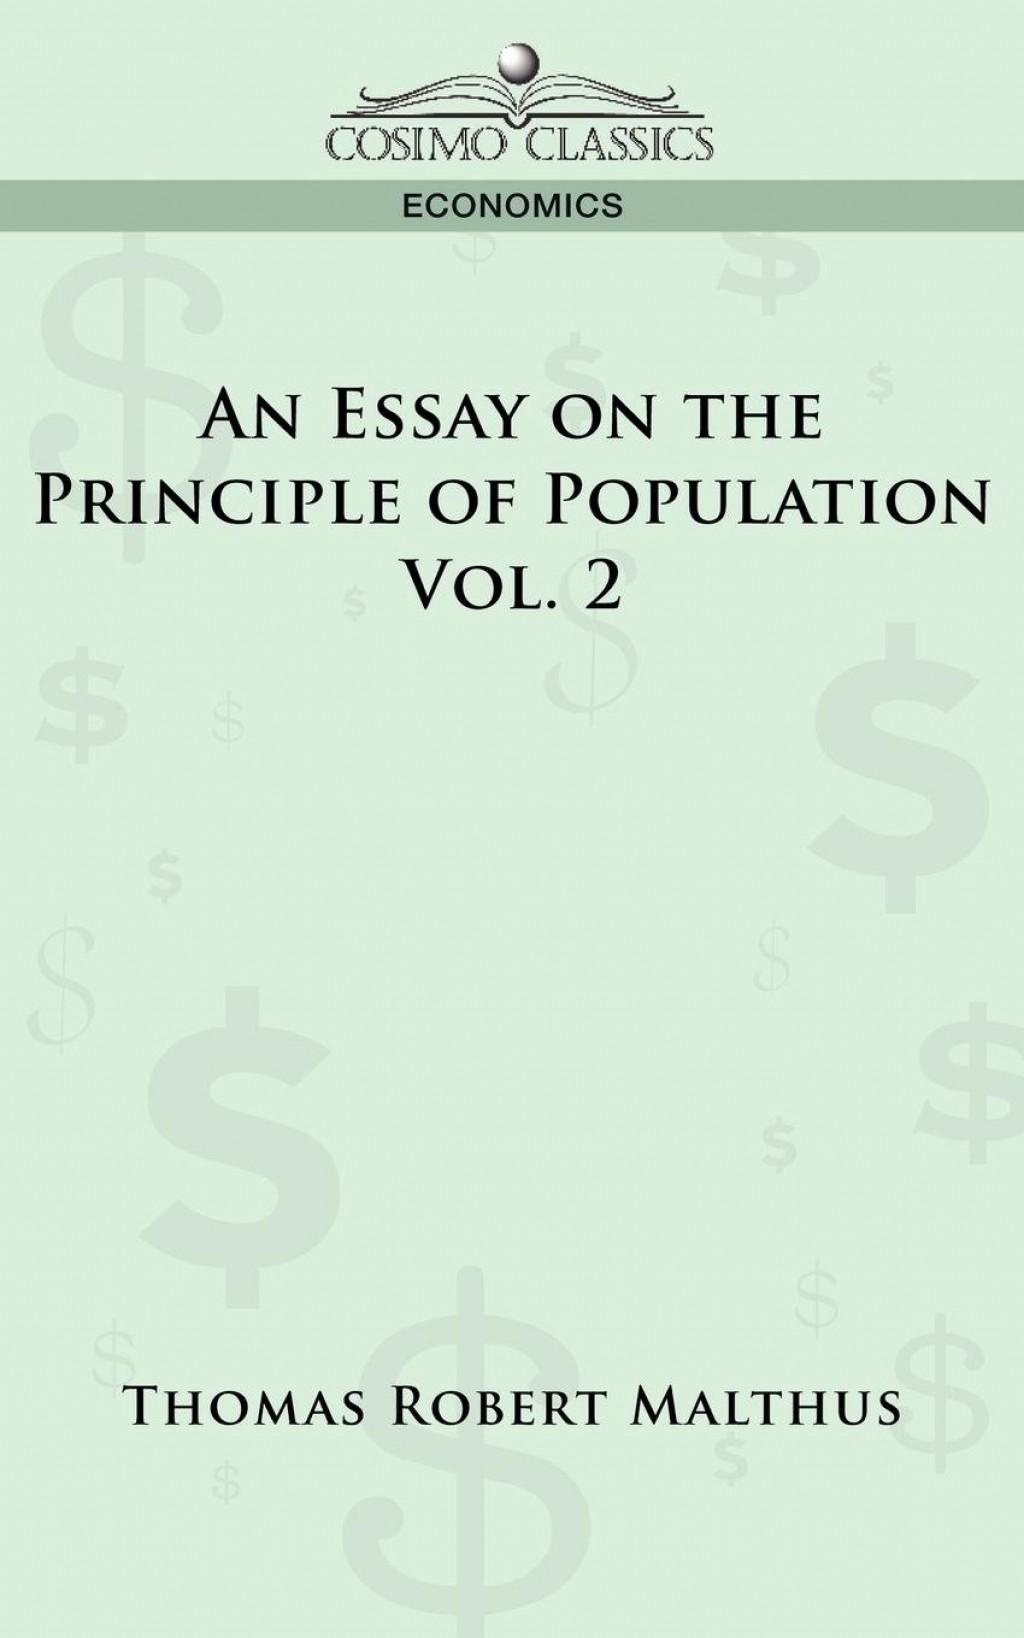 022 Essay Example Thomas Malthus On The Principle Of Population Stupendous After Reading Malthus's Principles Darwin Got Idea That Ap Euro Large